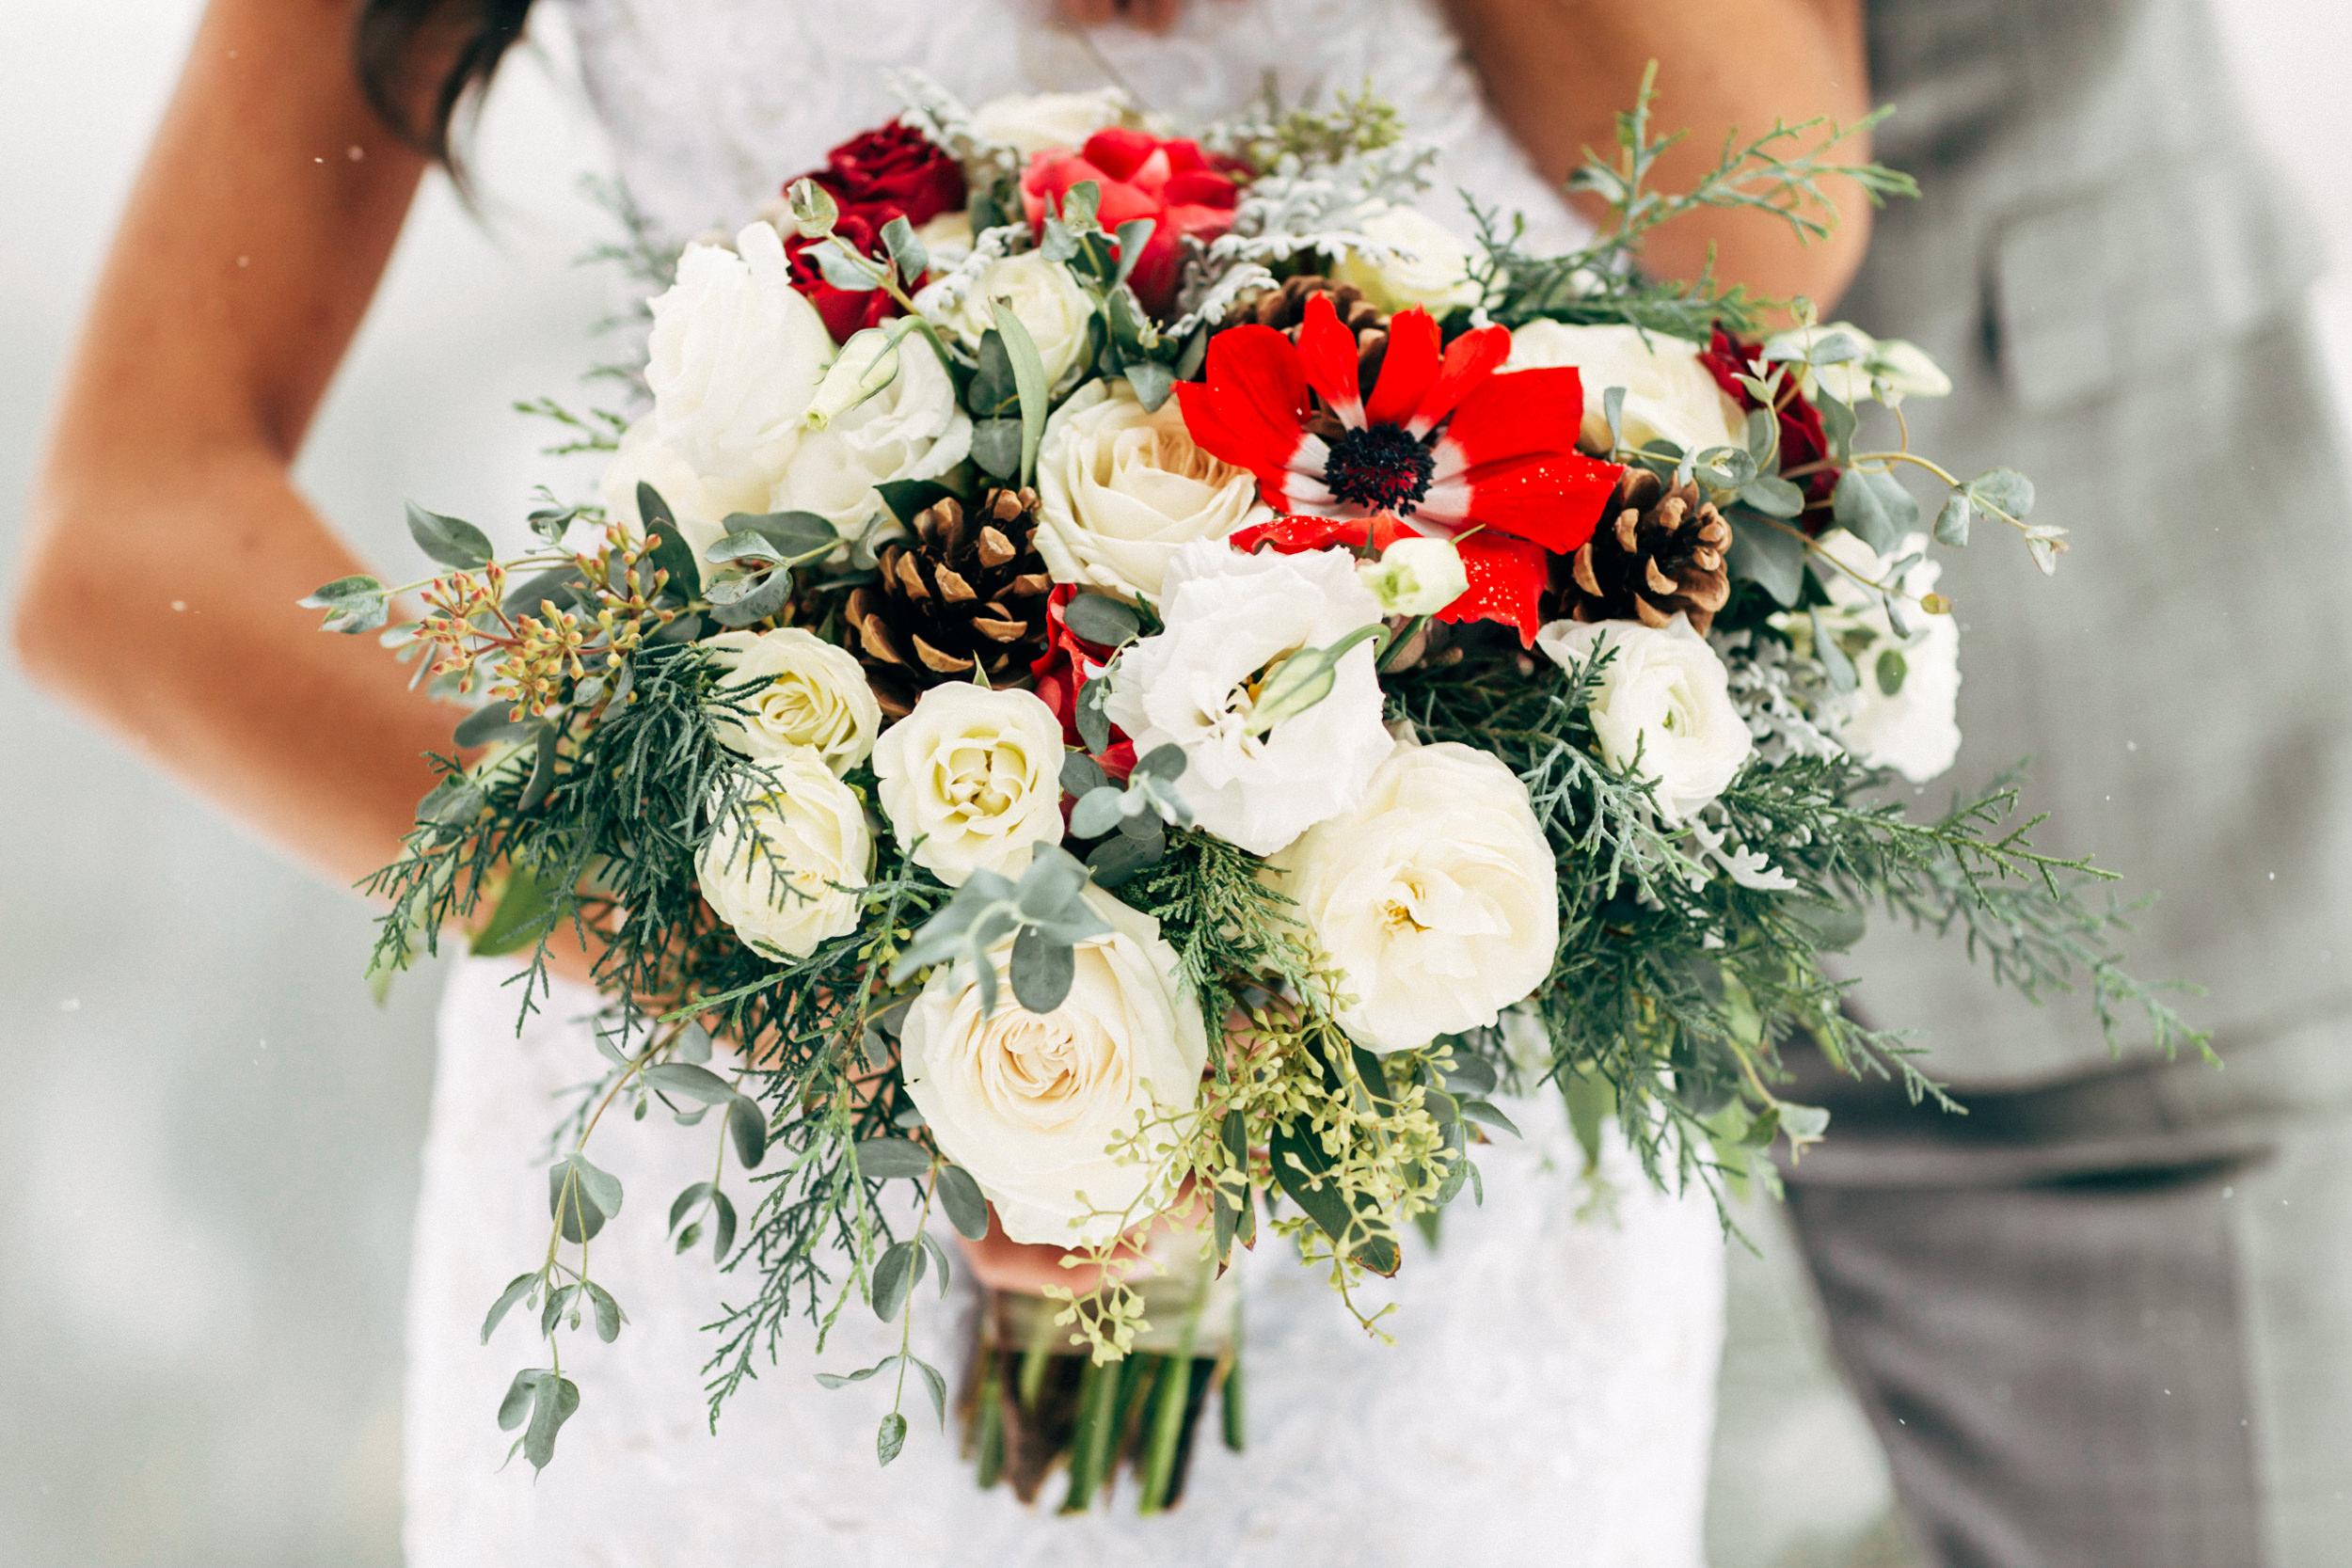 Petals and Bean bridal bouquet in Breckenridge, Colorado wedding photographer.